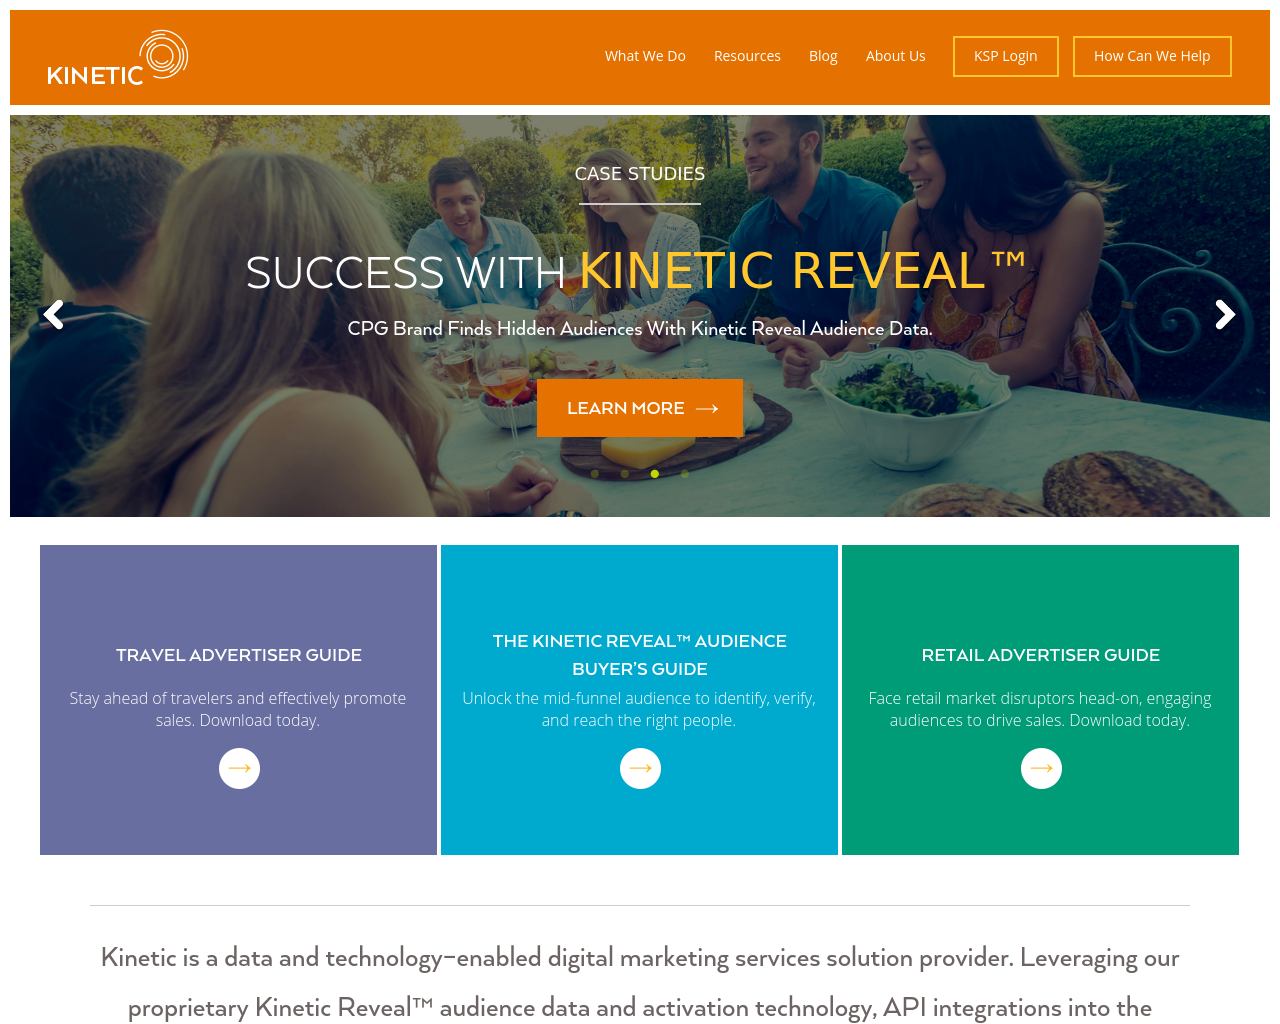 Kinetic-Social-Advertising-Reviews-Pricing